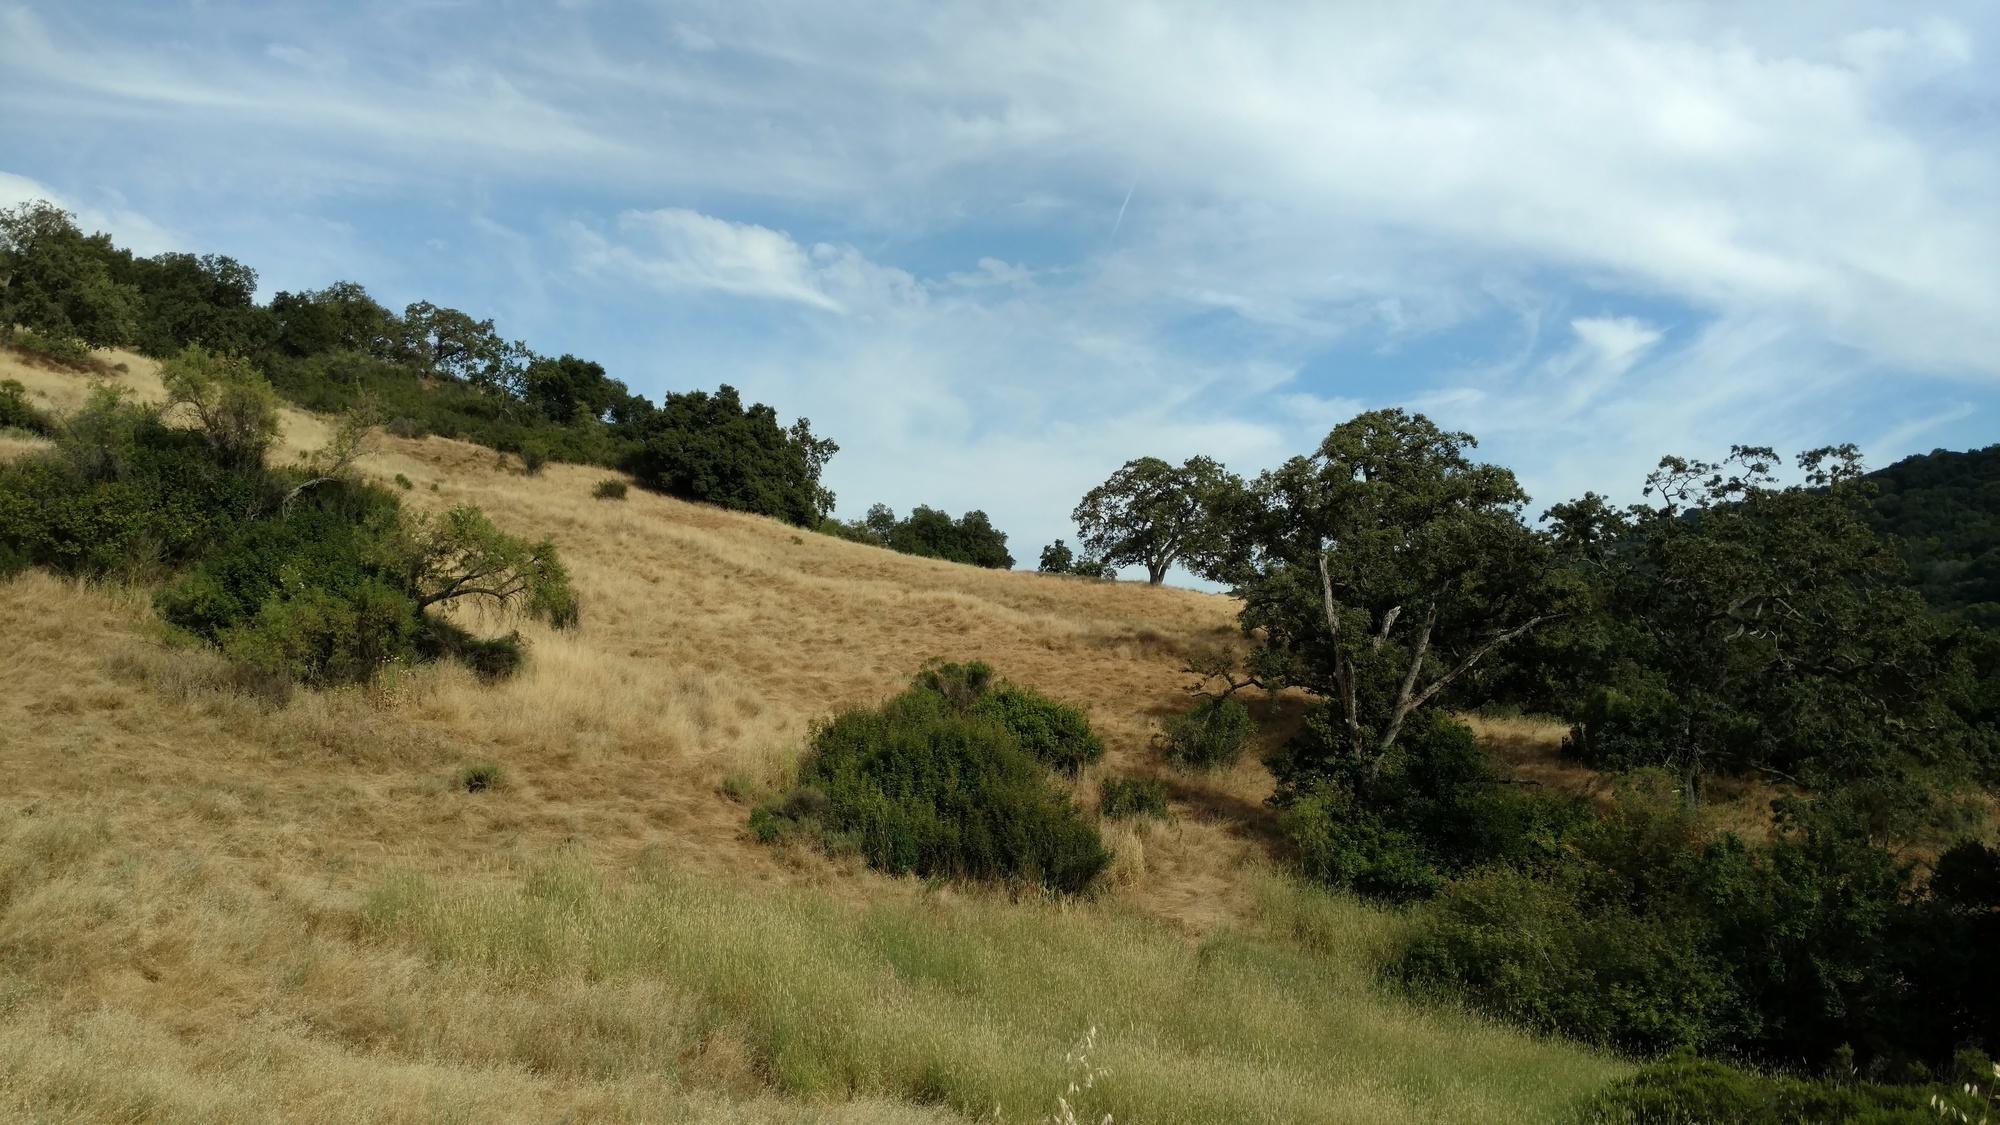 Pristine grass hills dot the landscape in Almaden ...